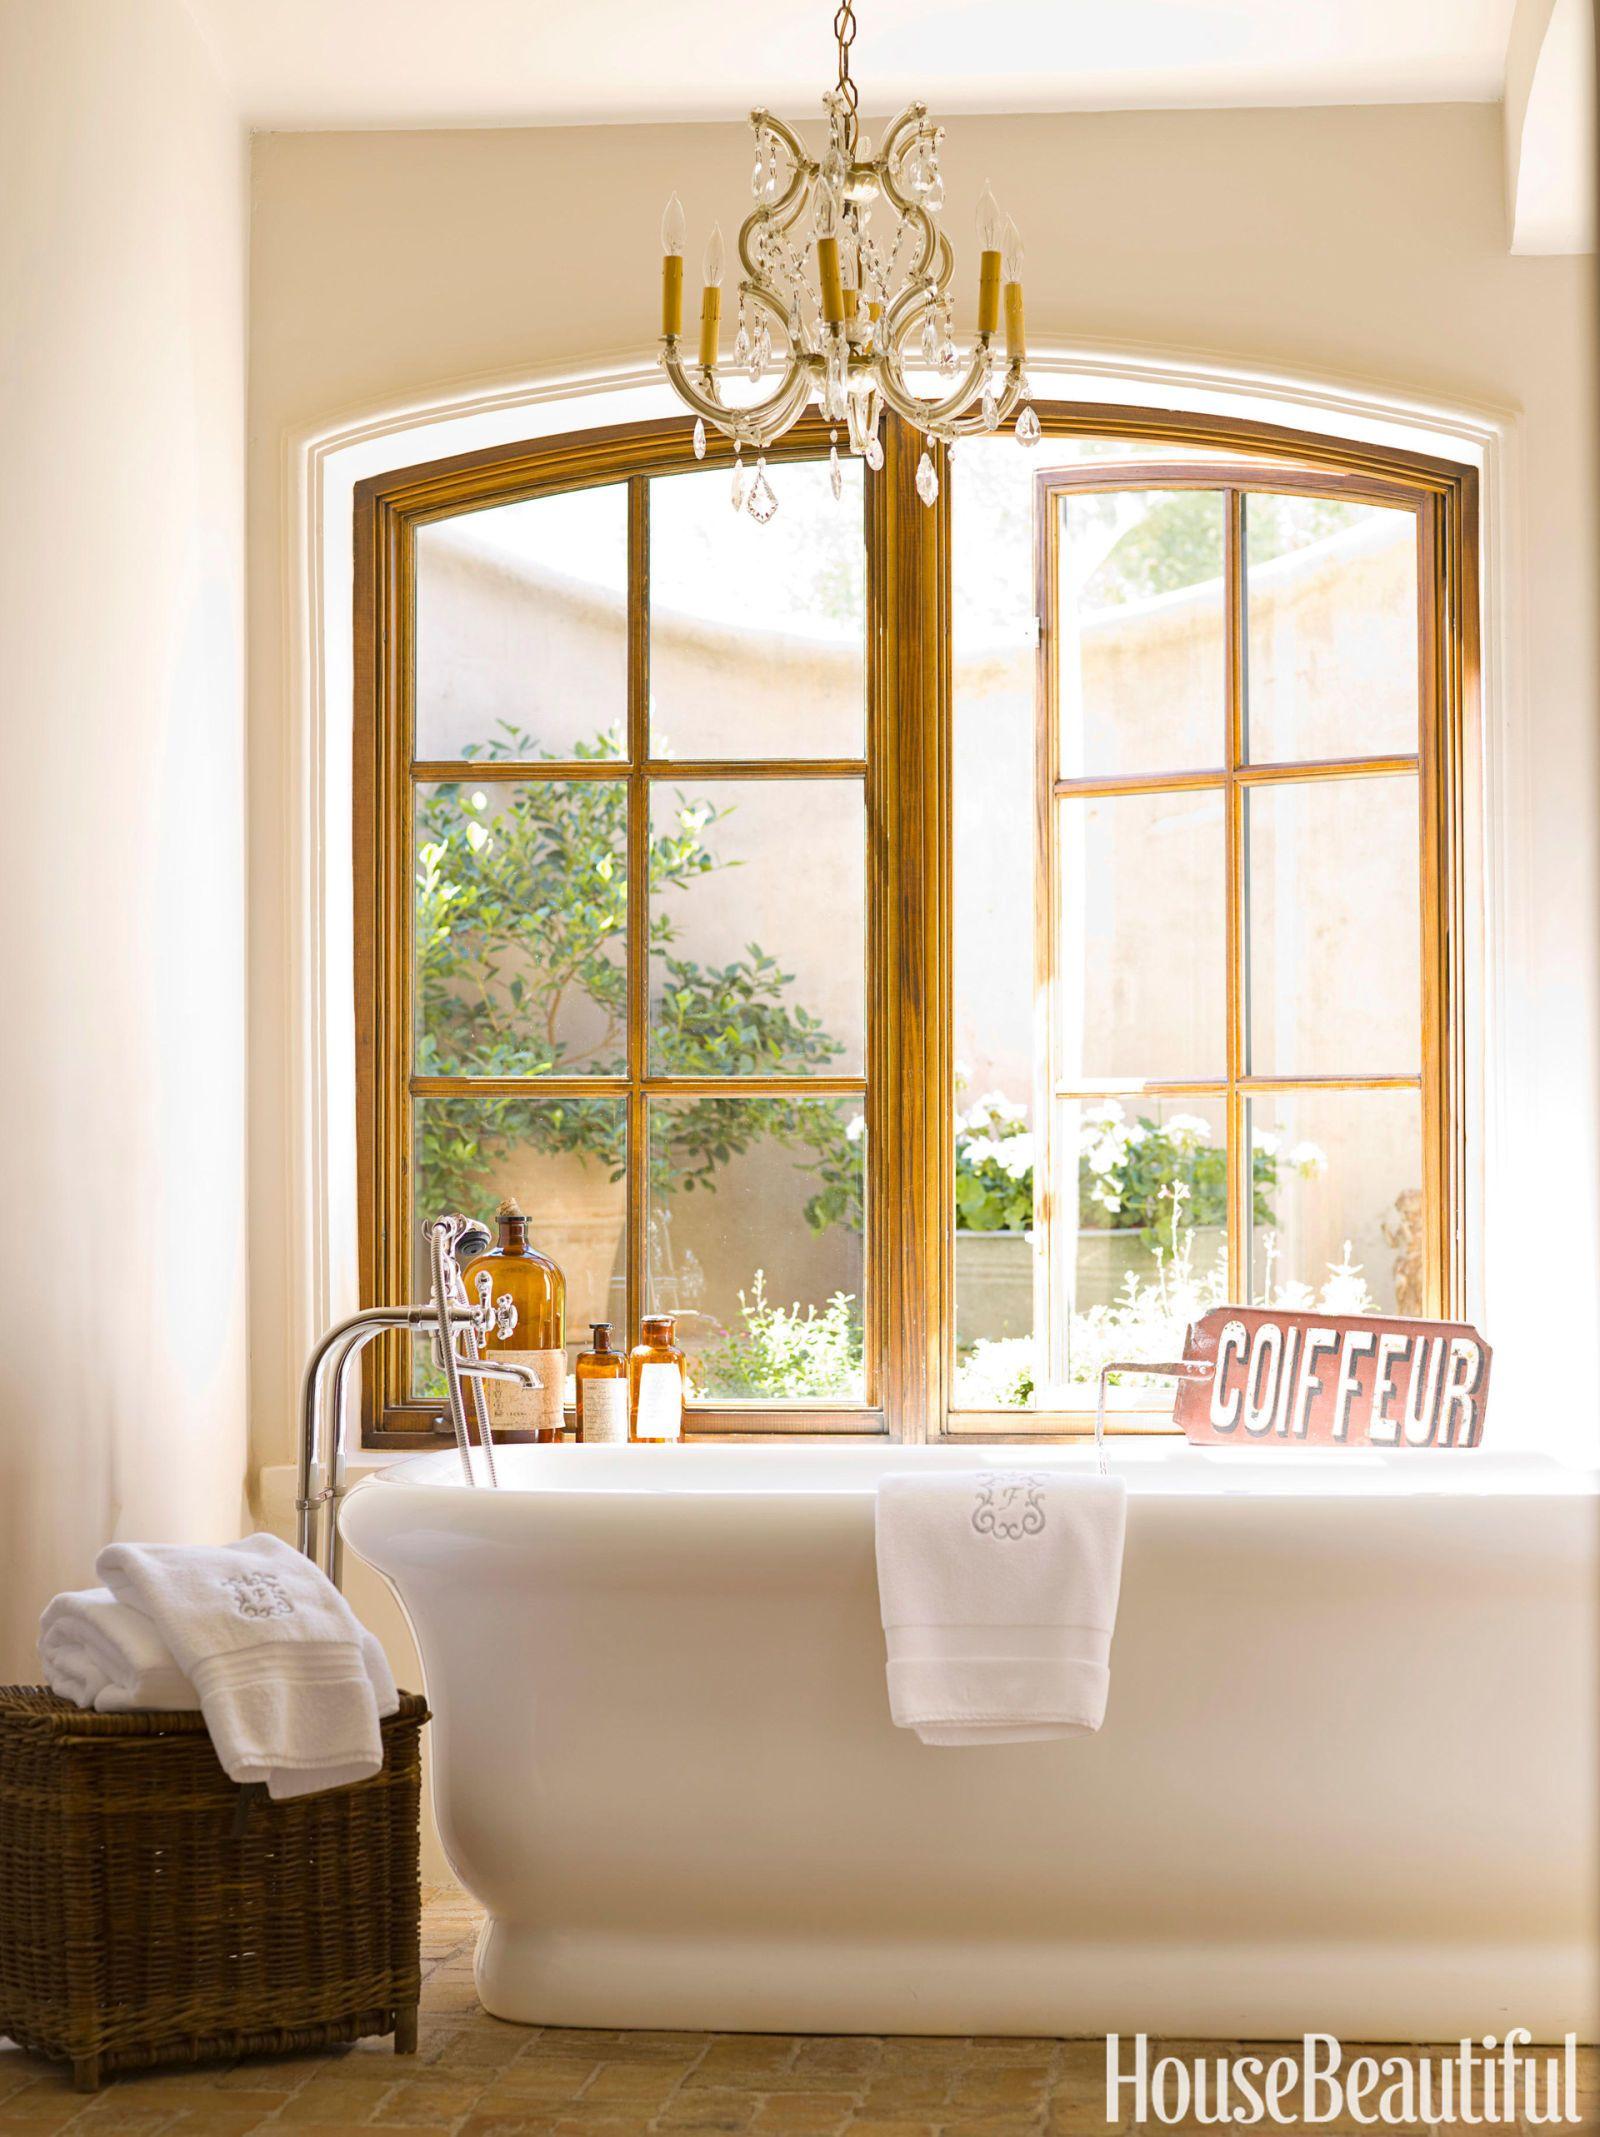 10 Ultra Glamorous Bathrooms